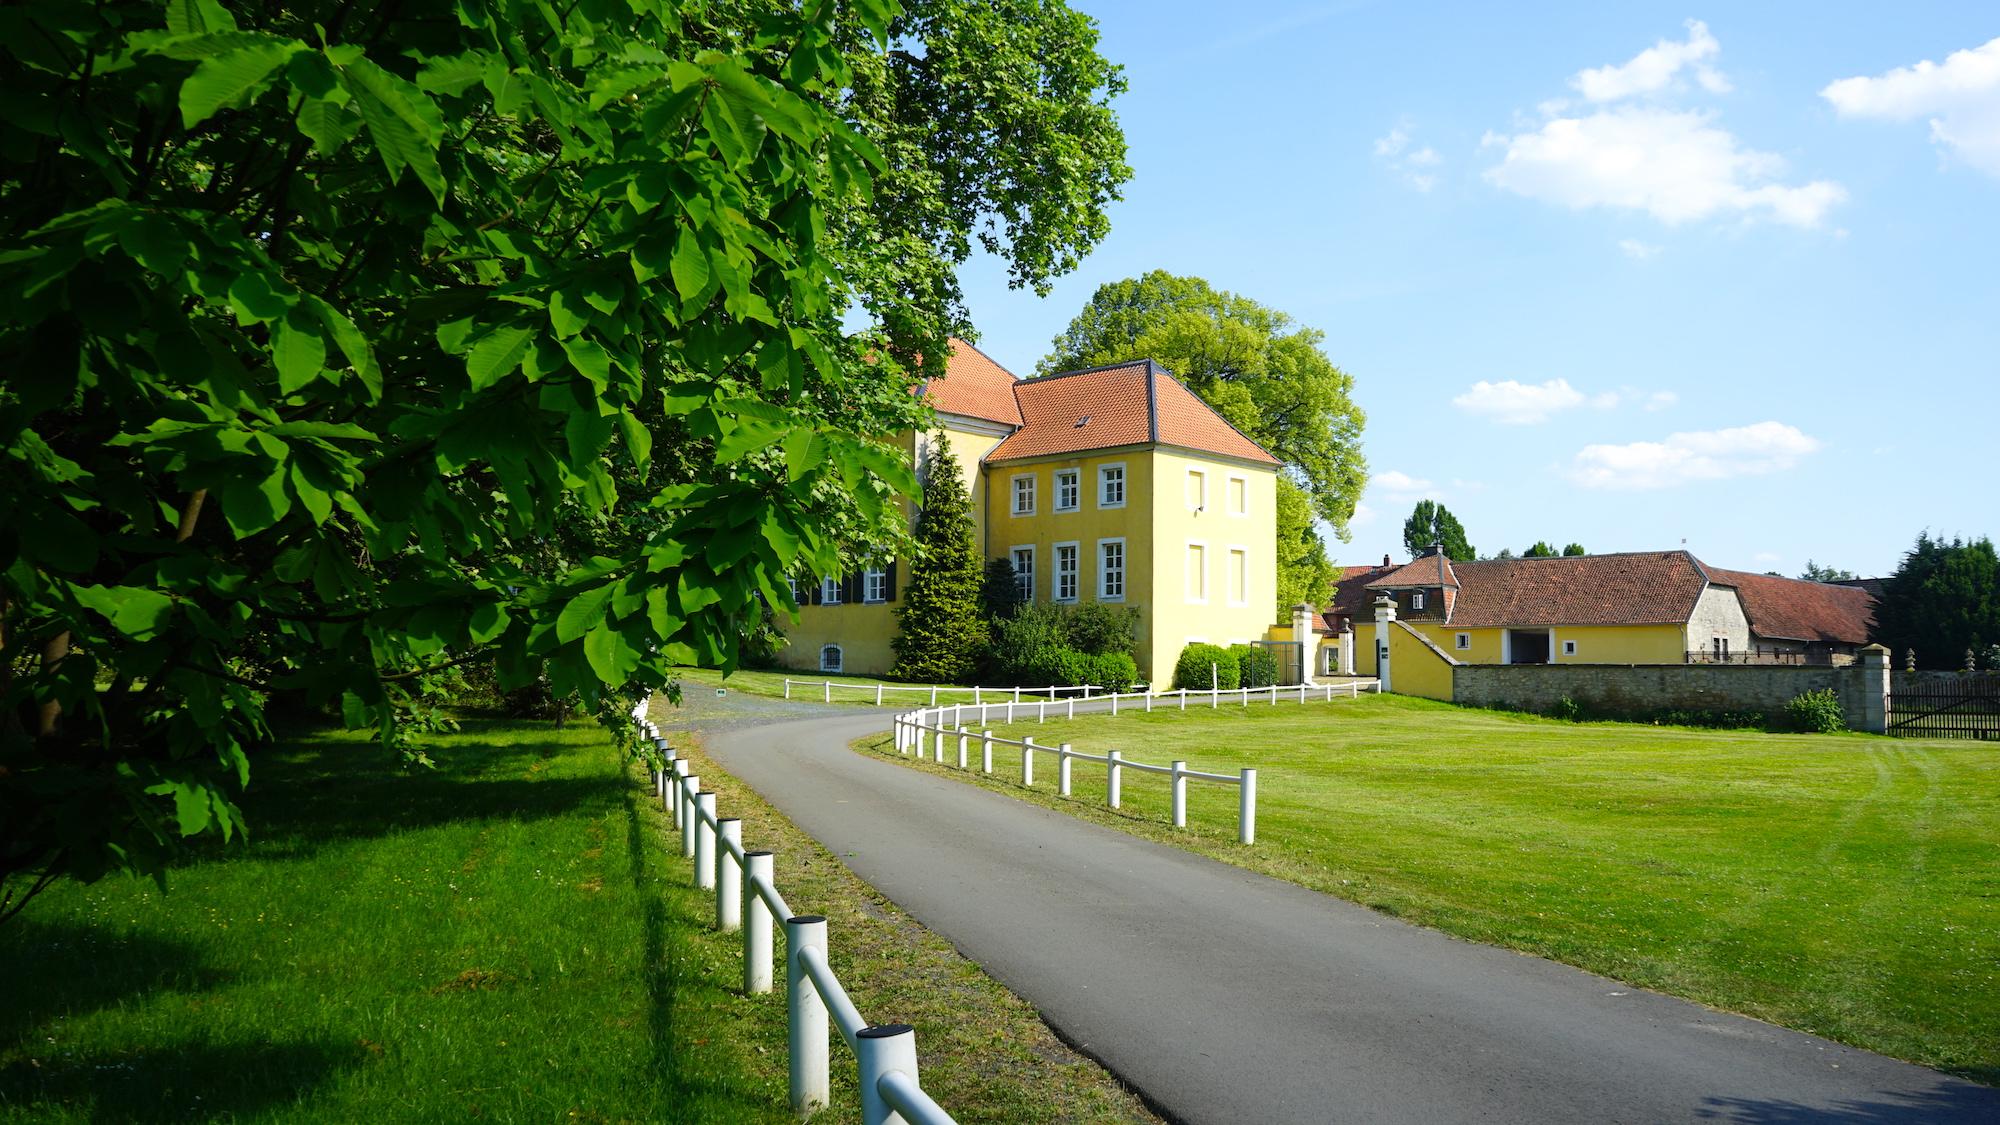 Schloss Destedt / Beate Ziehres